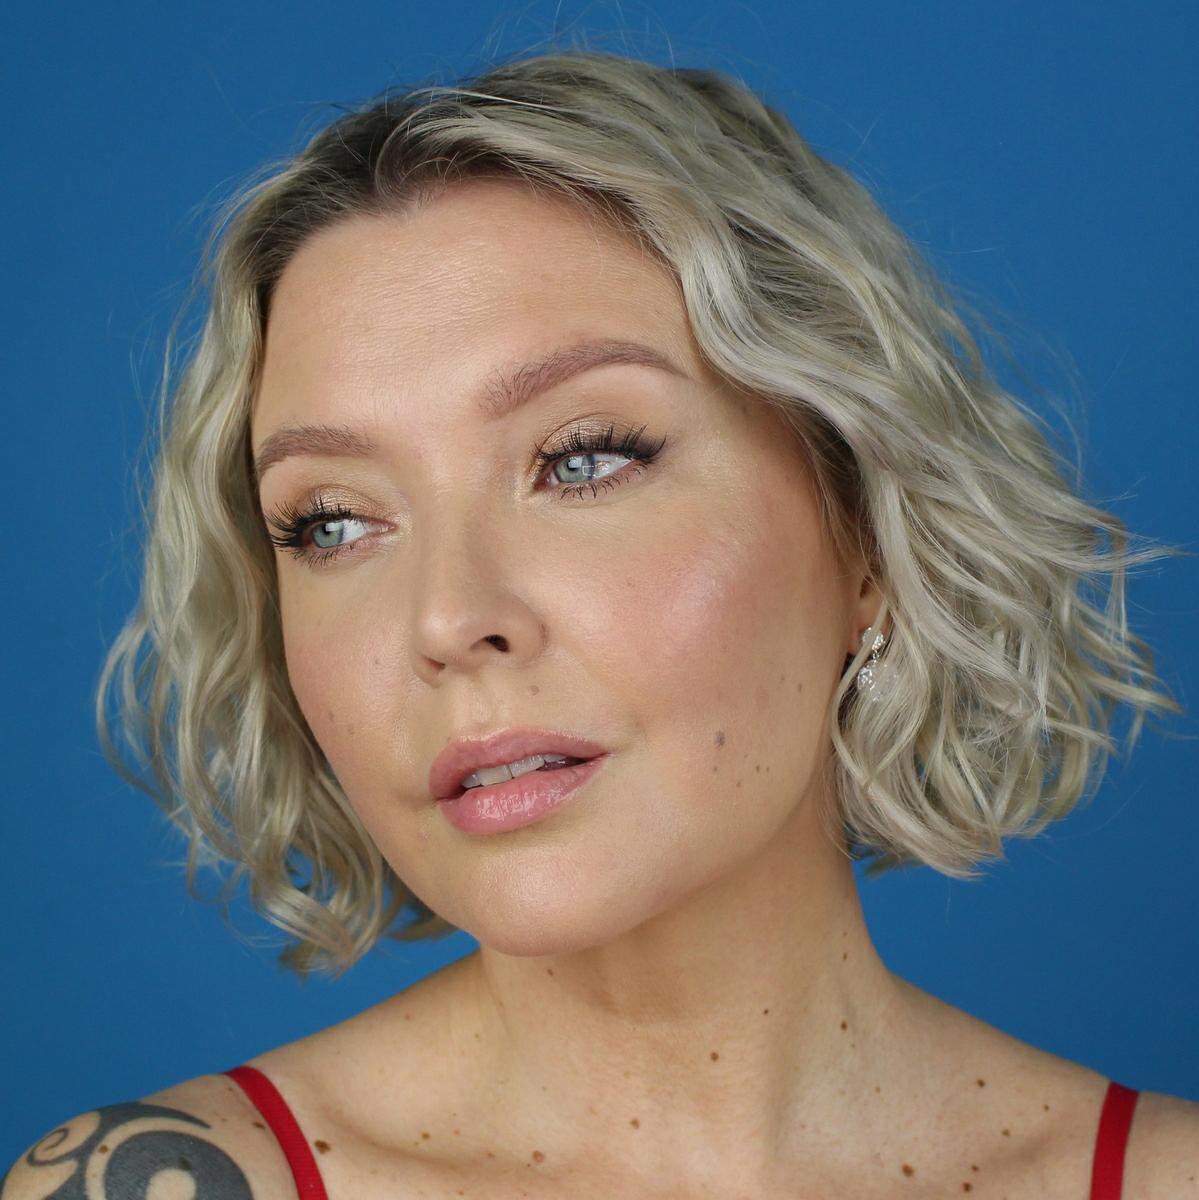 Miia Johansson